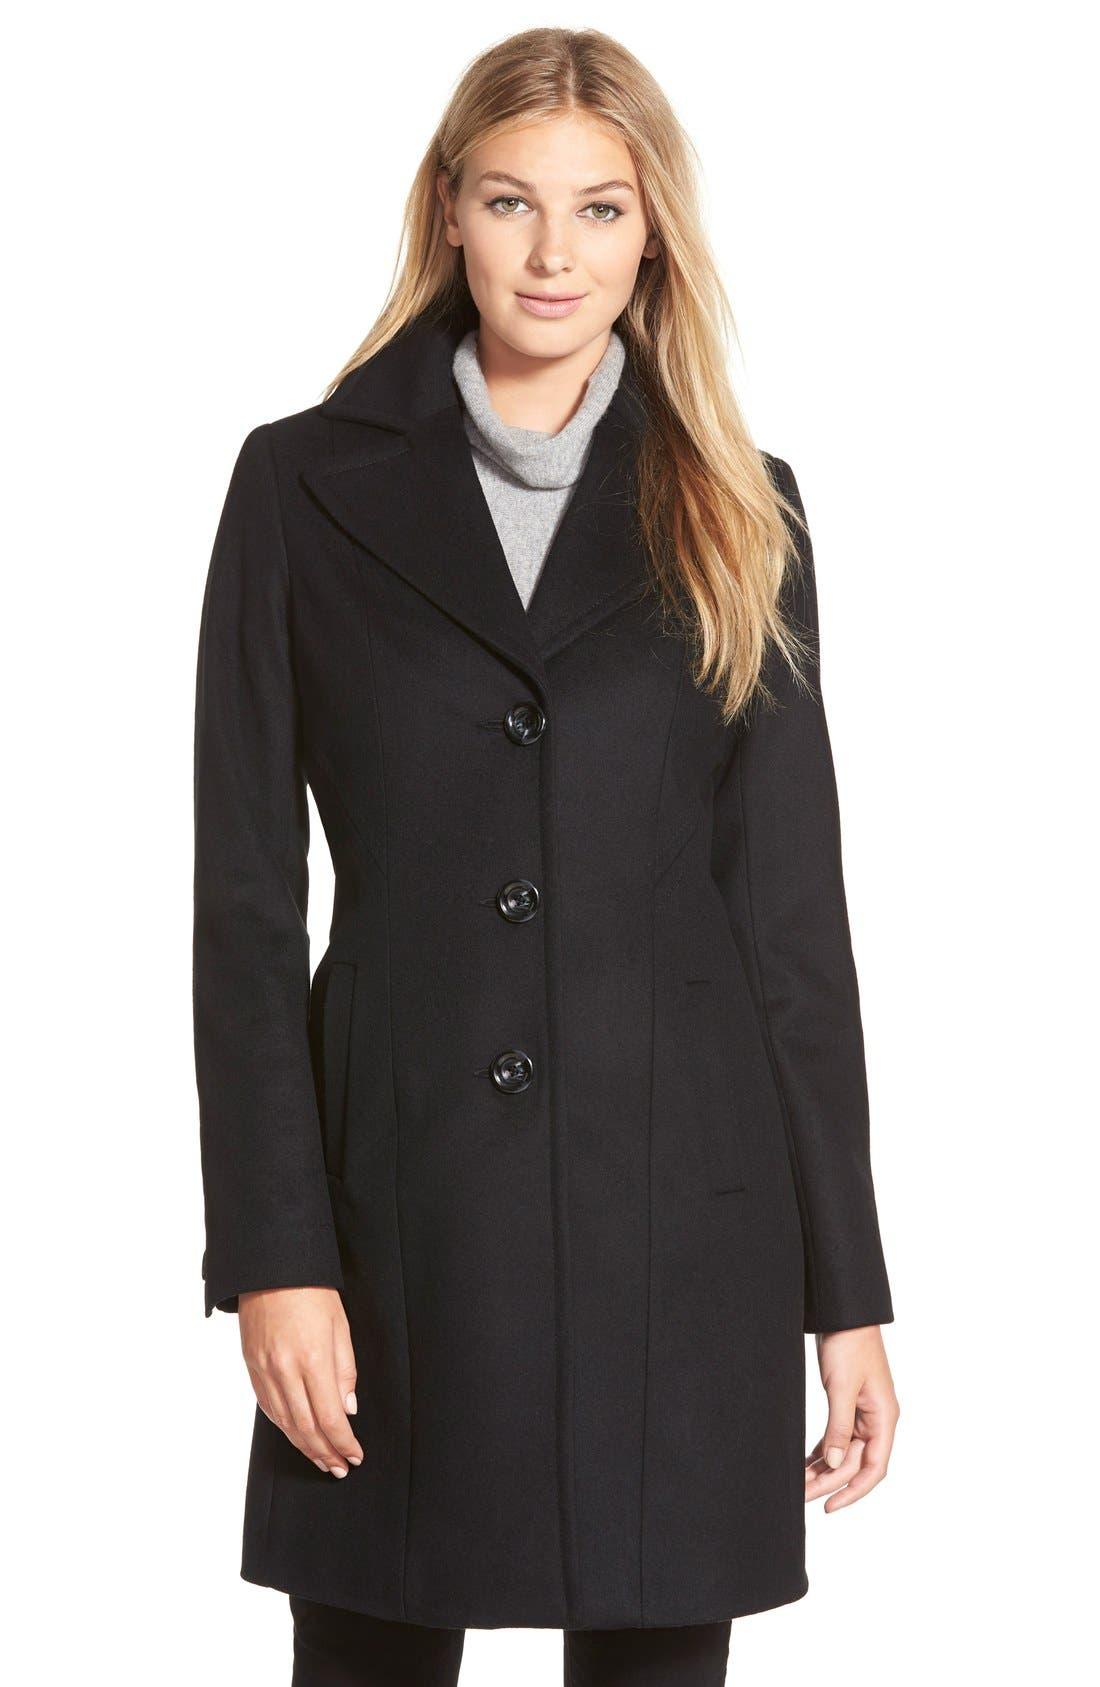 KRISTEN BLAKE Single Breasted Wool Blend Coat, Main, color, 001